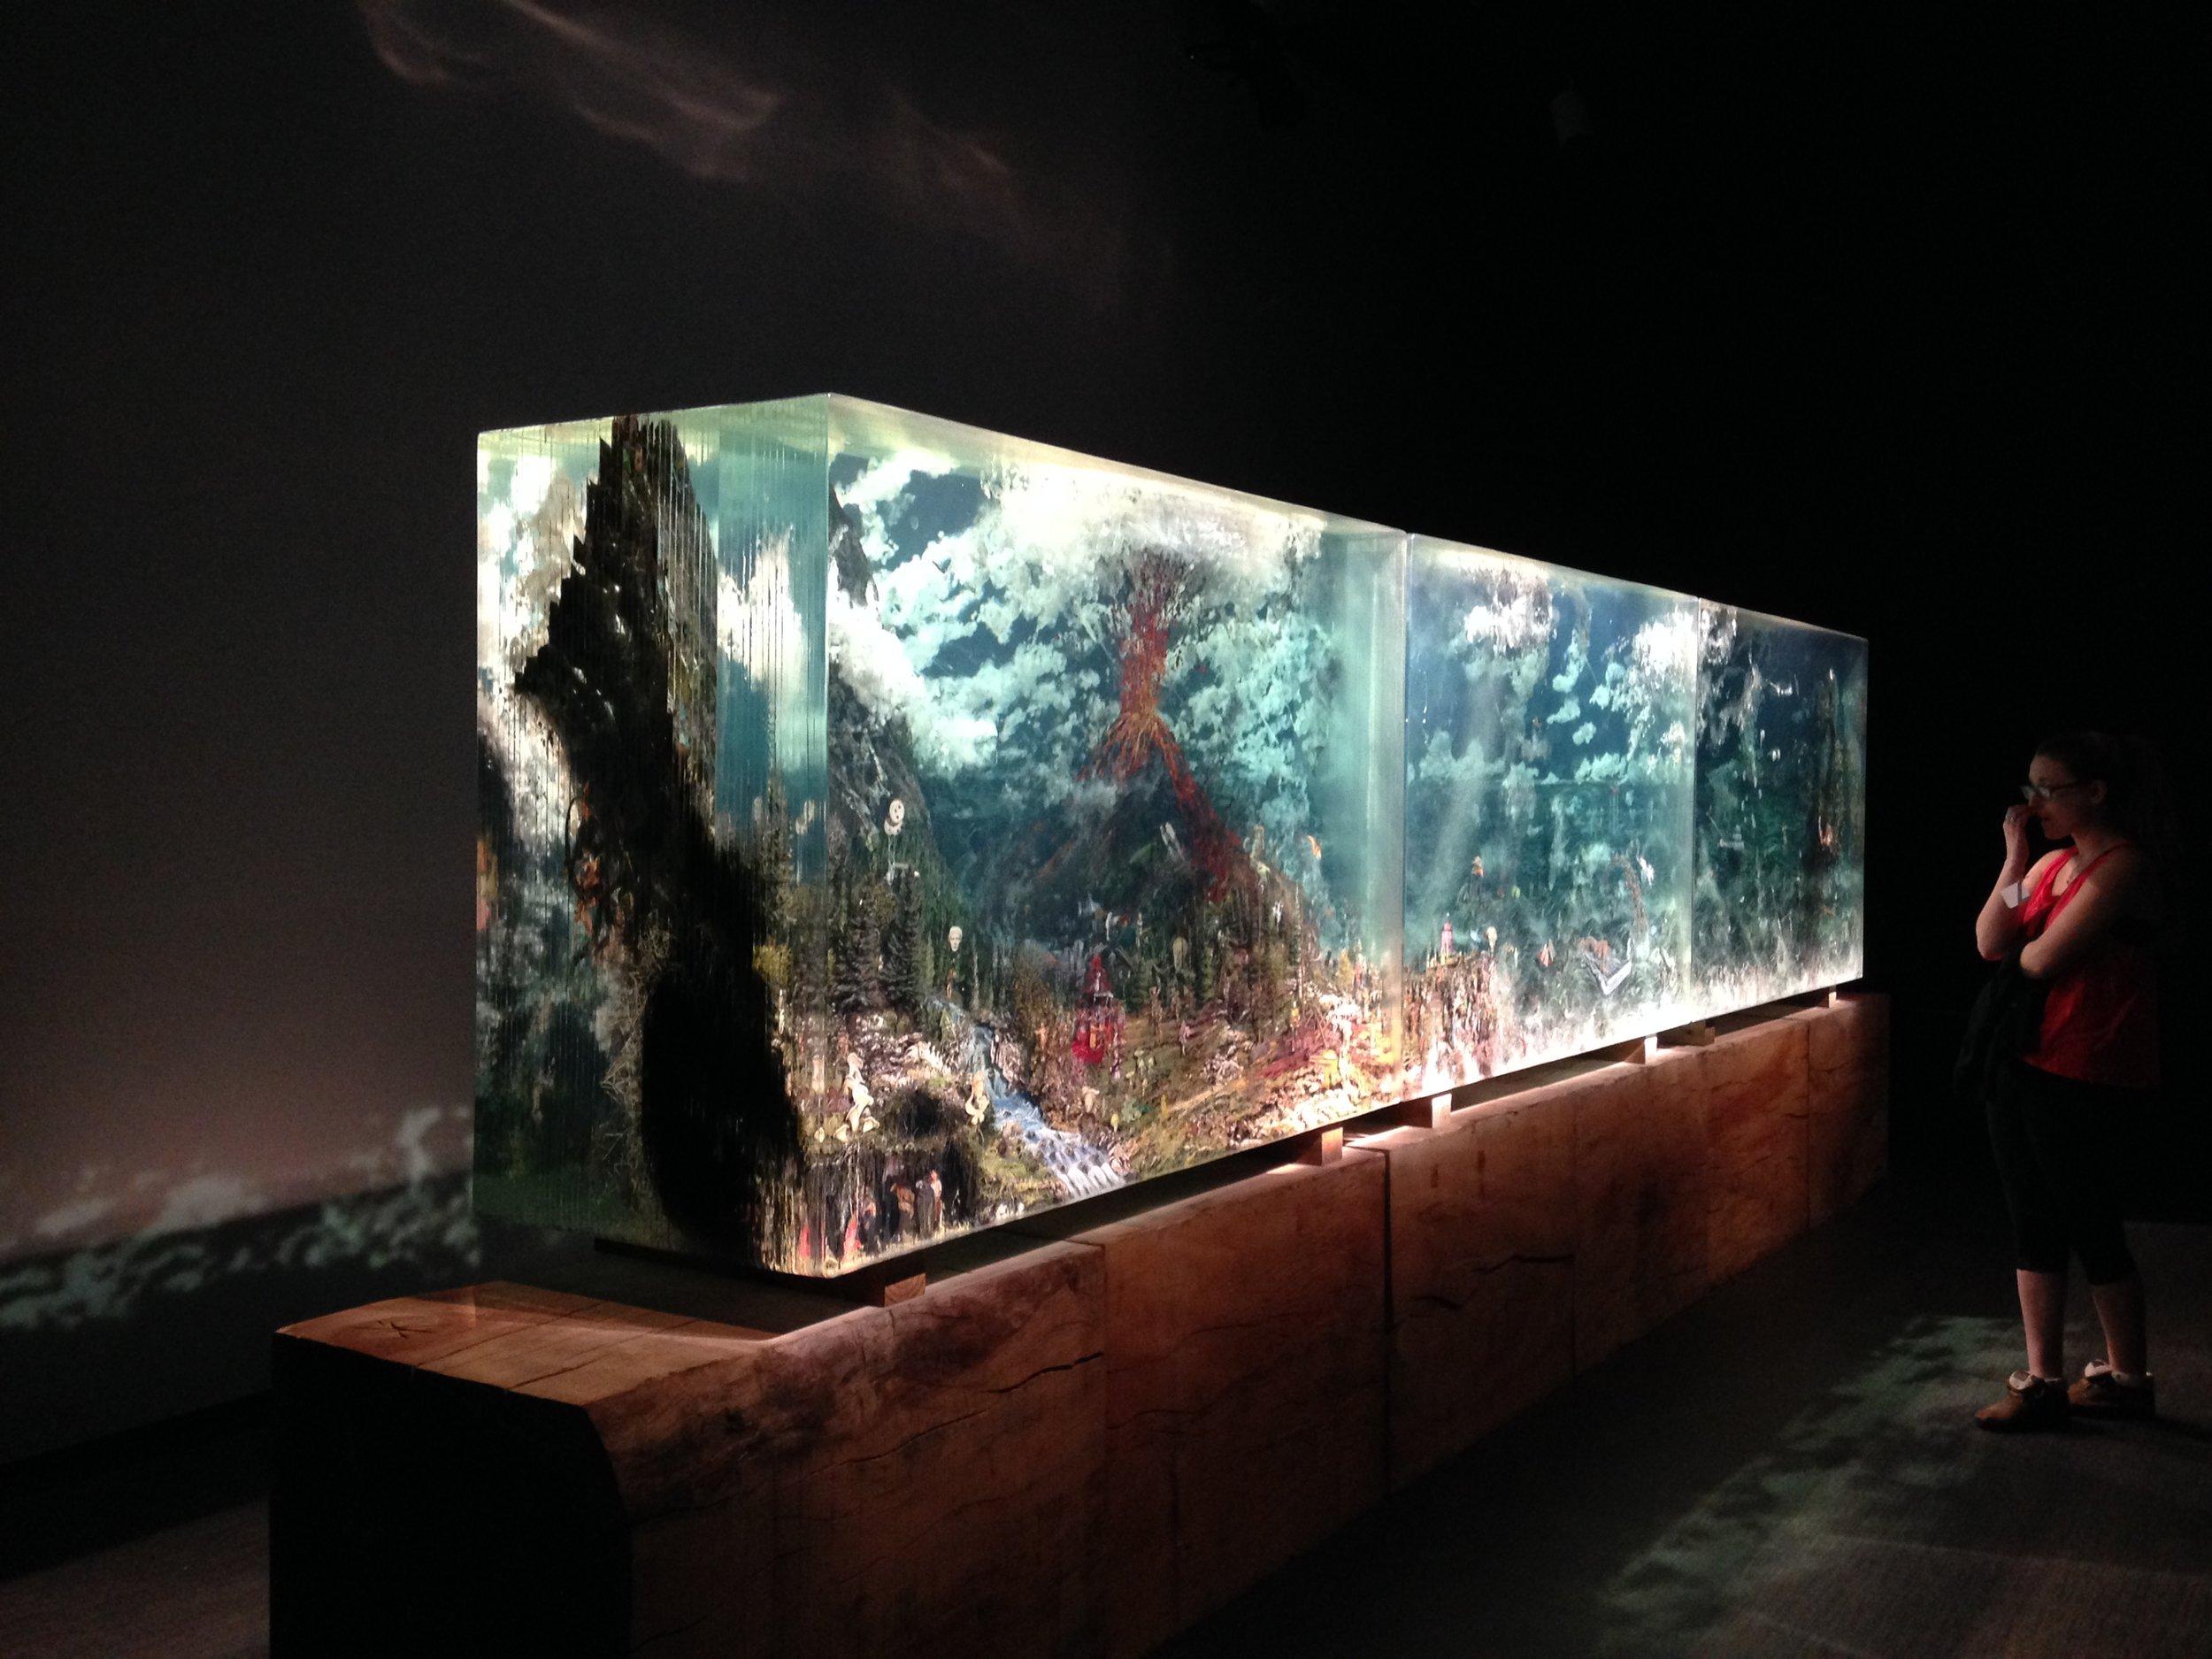 "The Triptych by Dustin Yellin, 2012, glass, acrylic, collage, 46.5"" x 208"" x 27"""